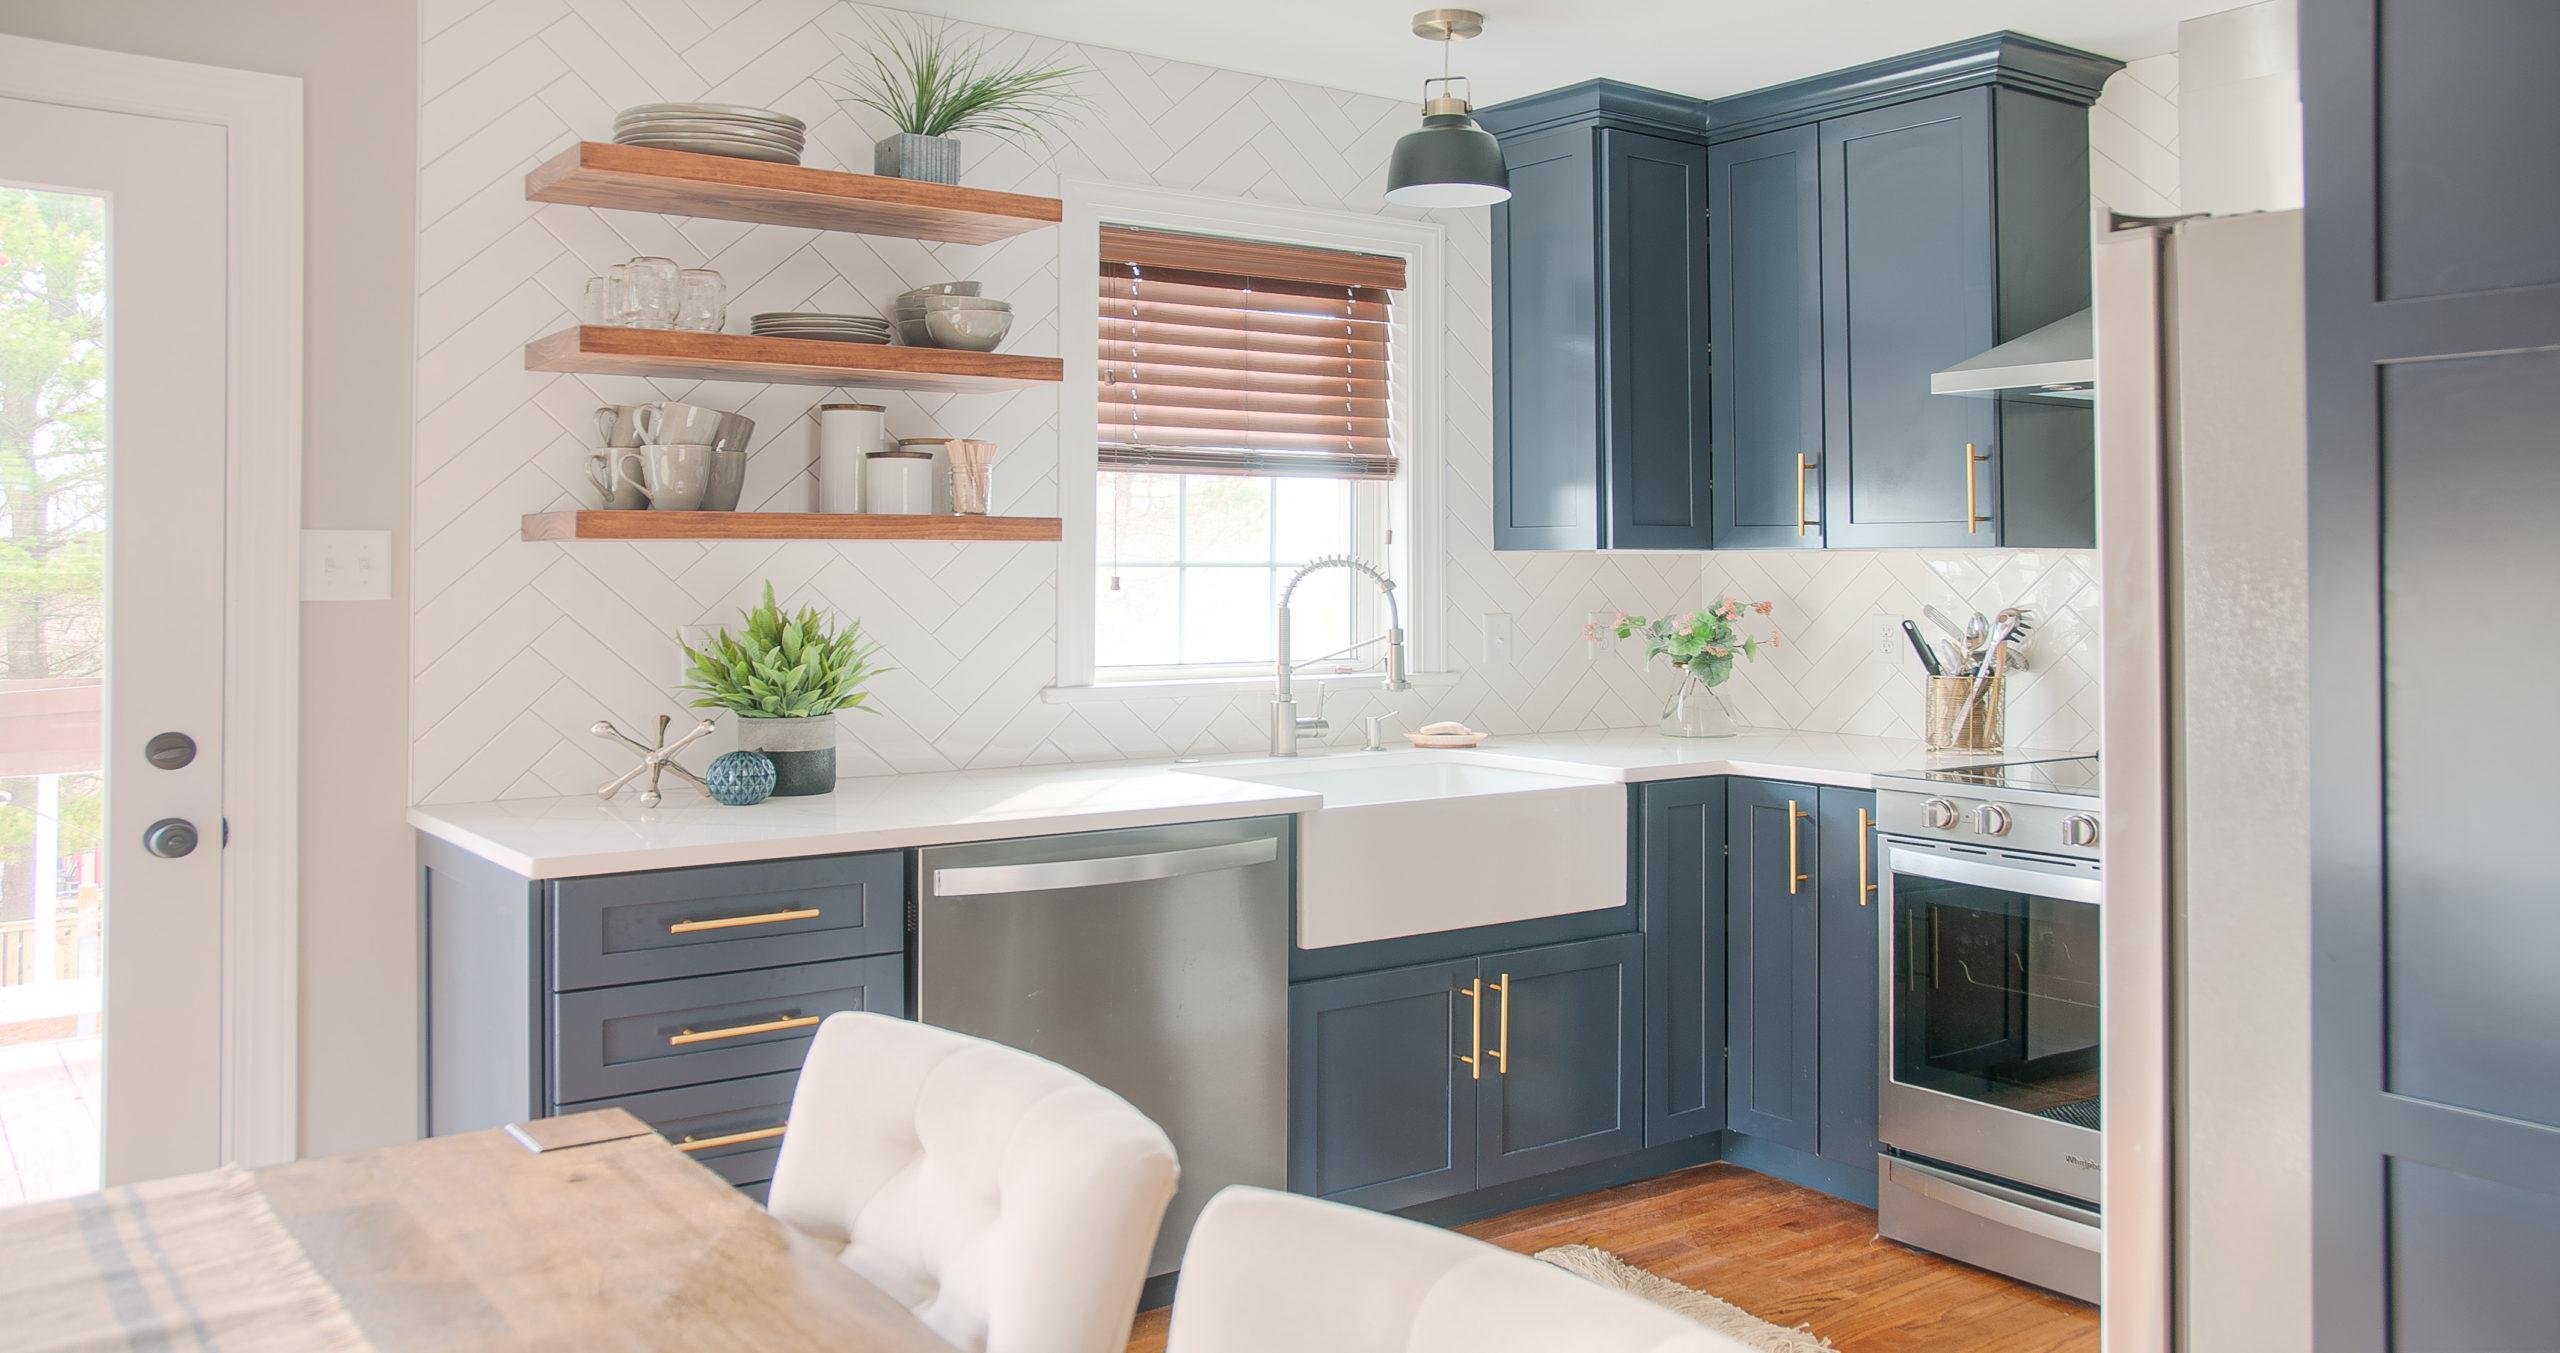 homes kitchen and bathroom updates